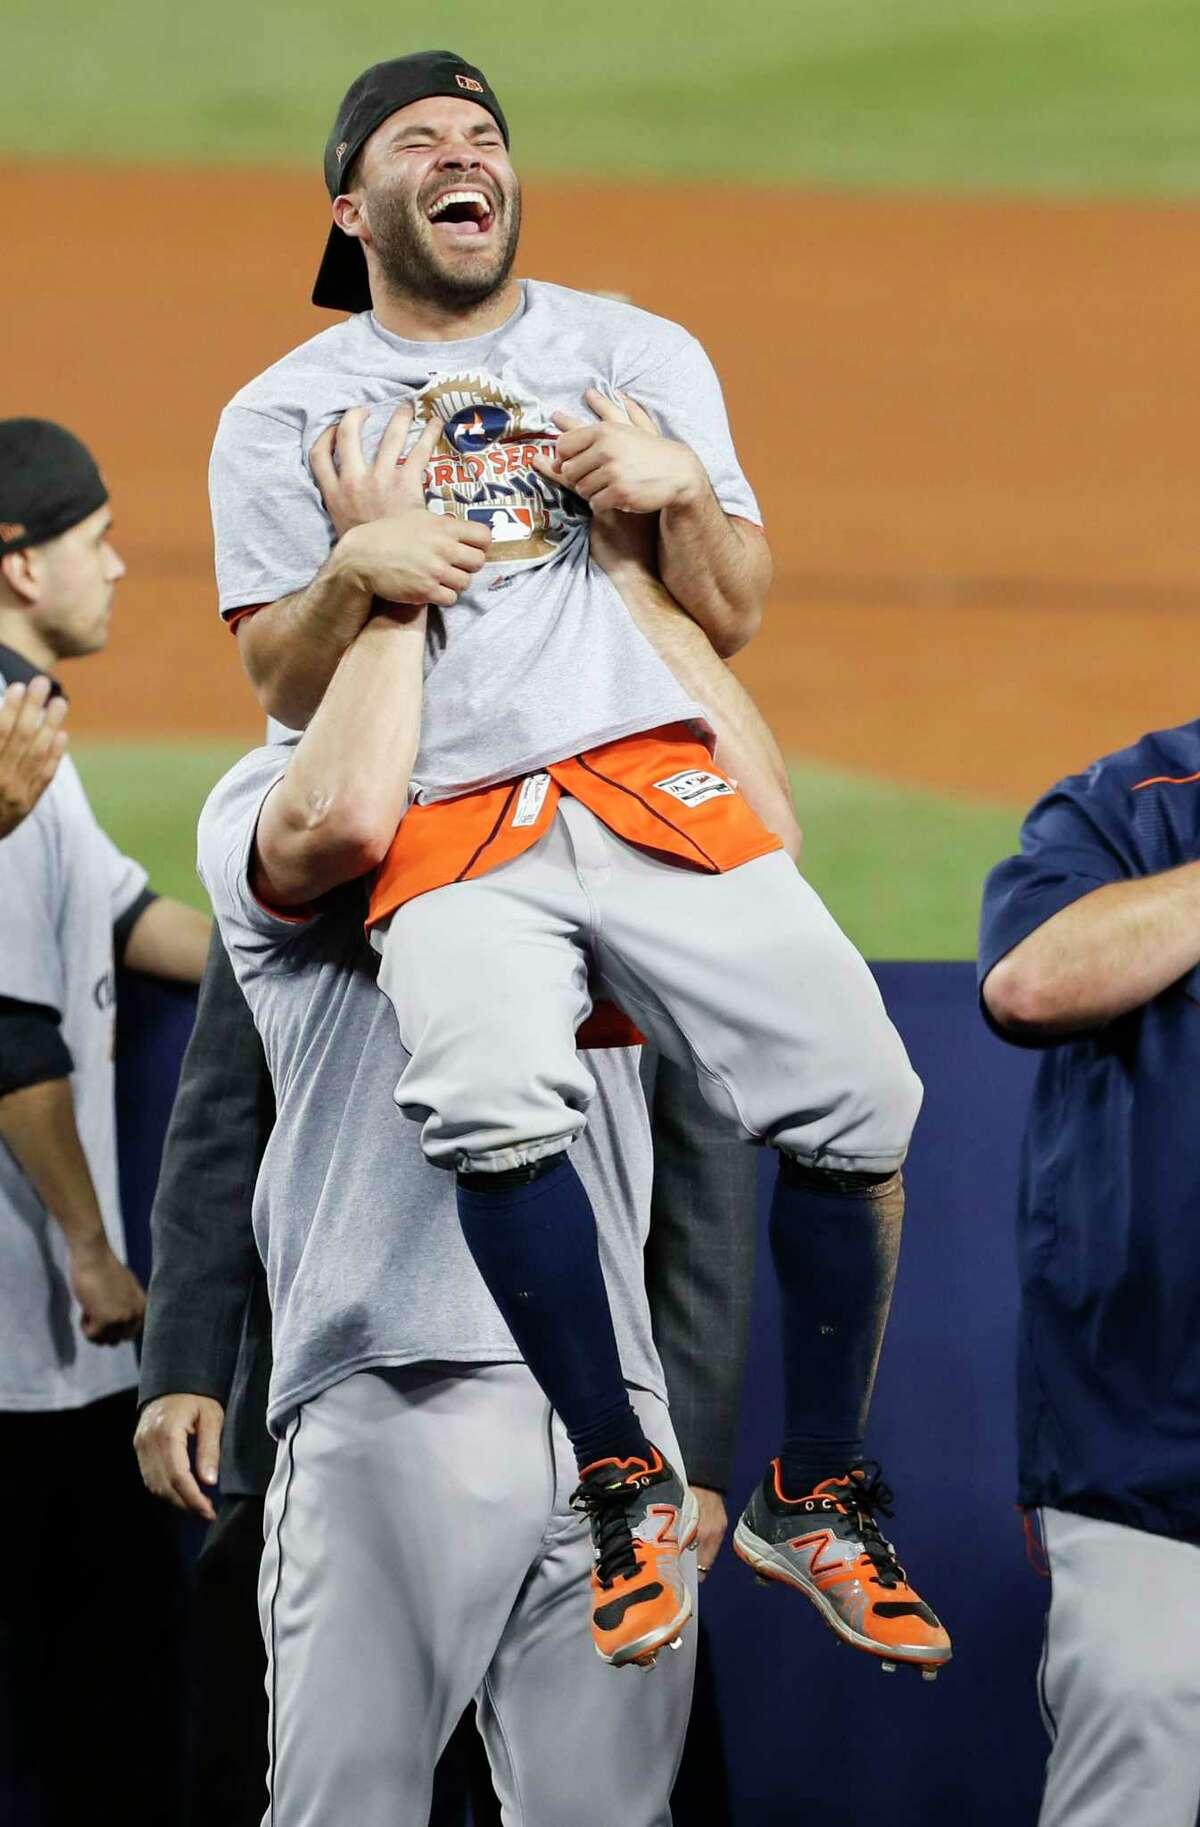 Houston Astros Odds: +500